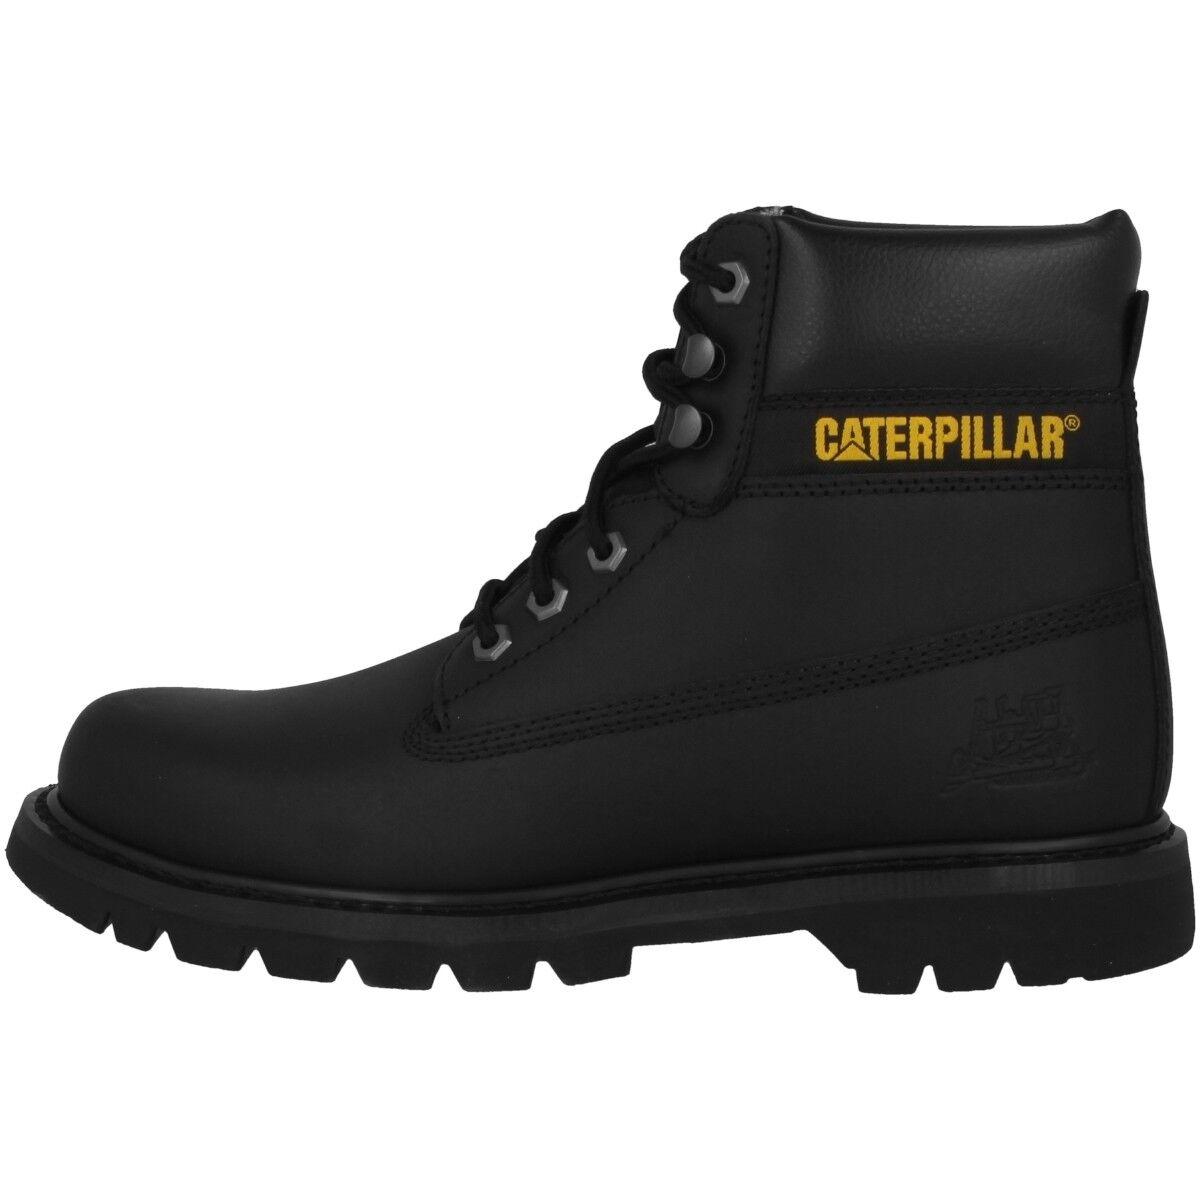 Cat Caterpillar Colorado botas Hombre Calzado de Trabajo PWC44100-709